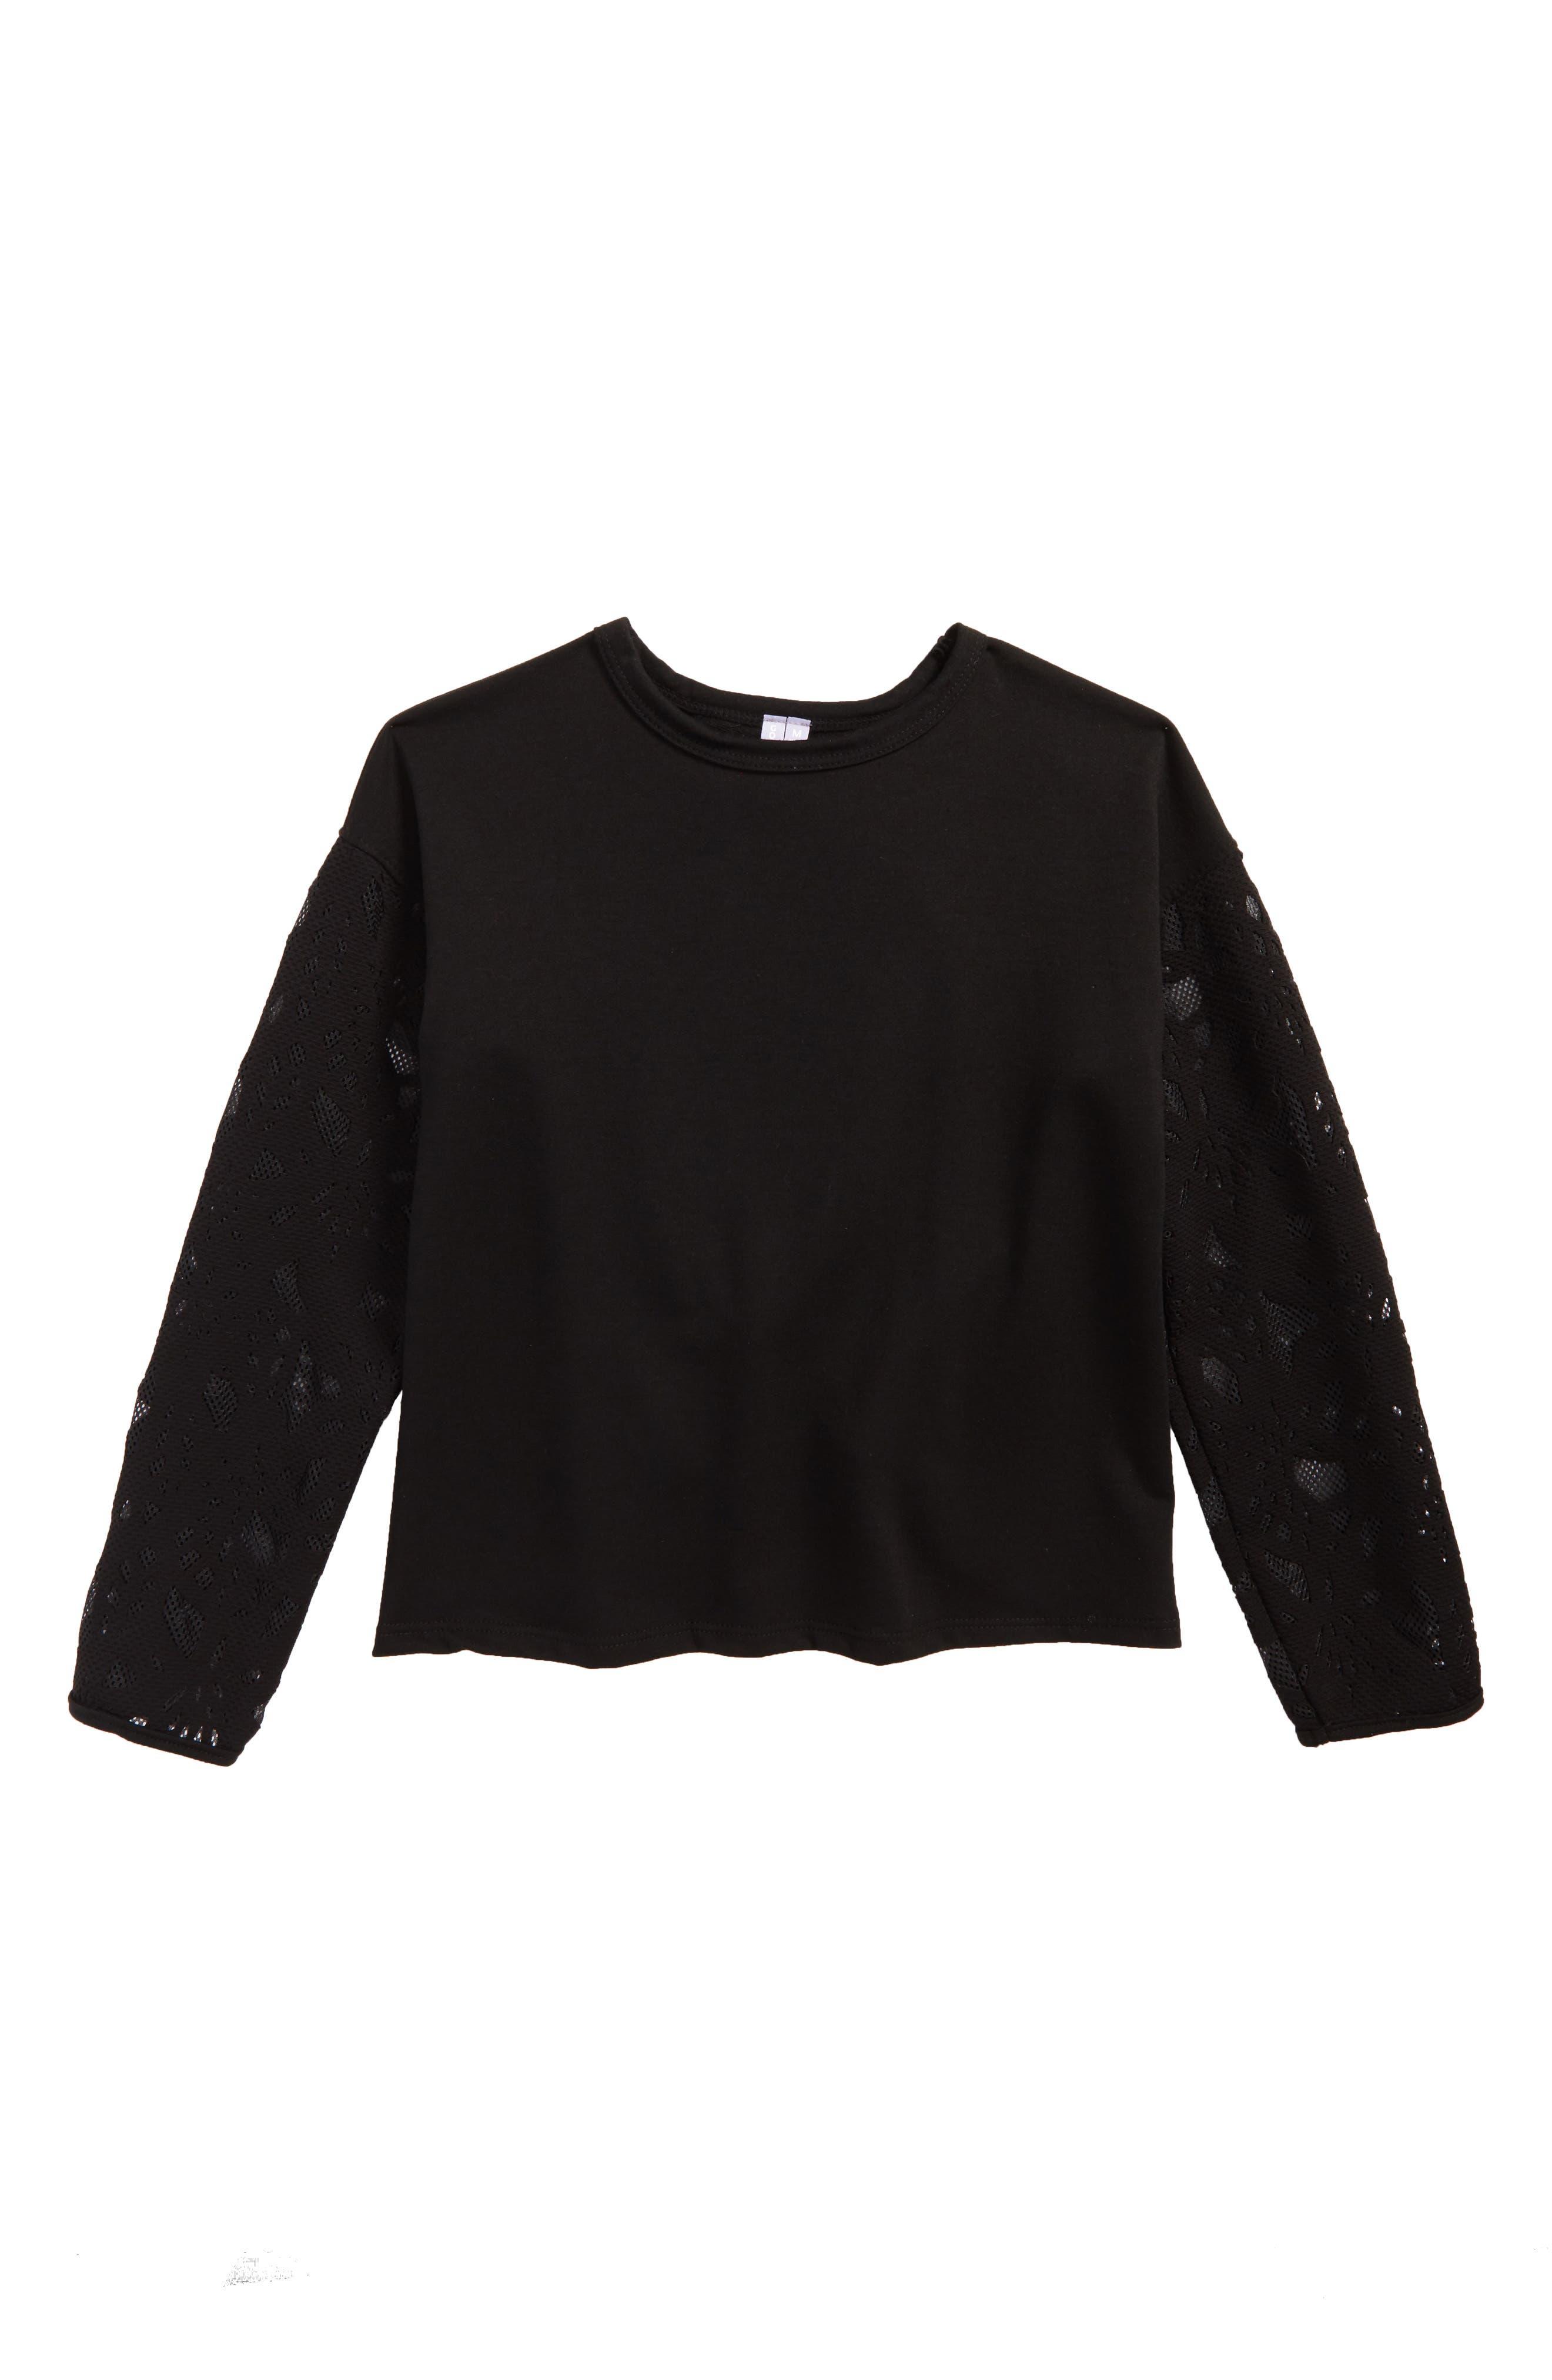 Main Image - Good Luck Gem Contrast Sleeve Sweatshirt (Big Girls)